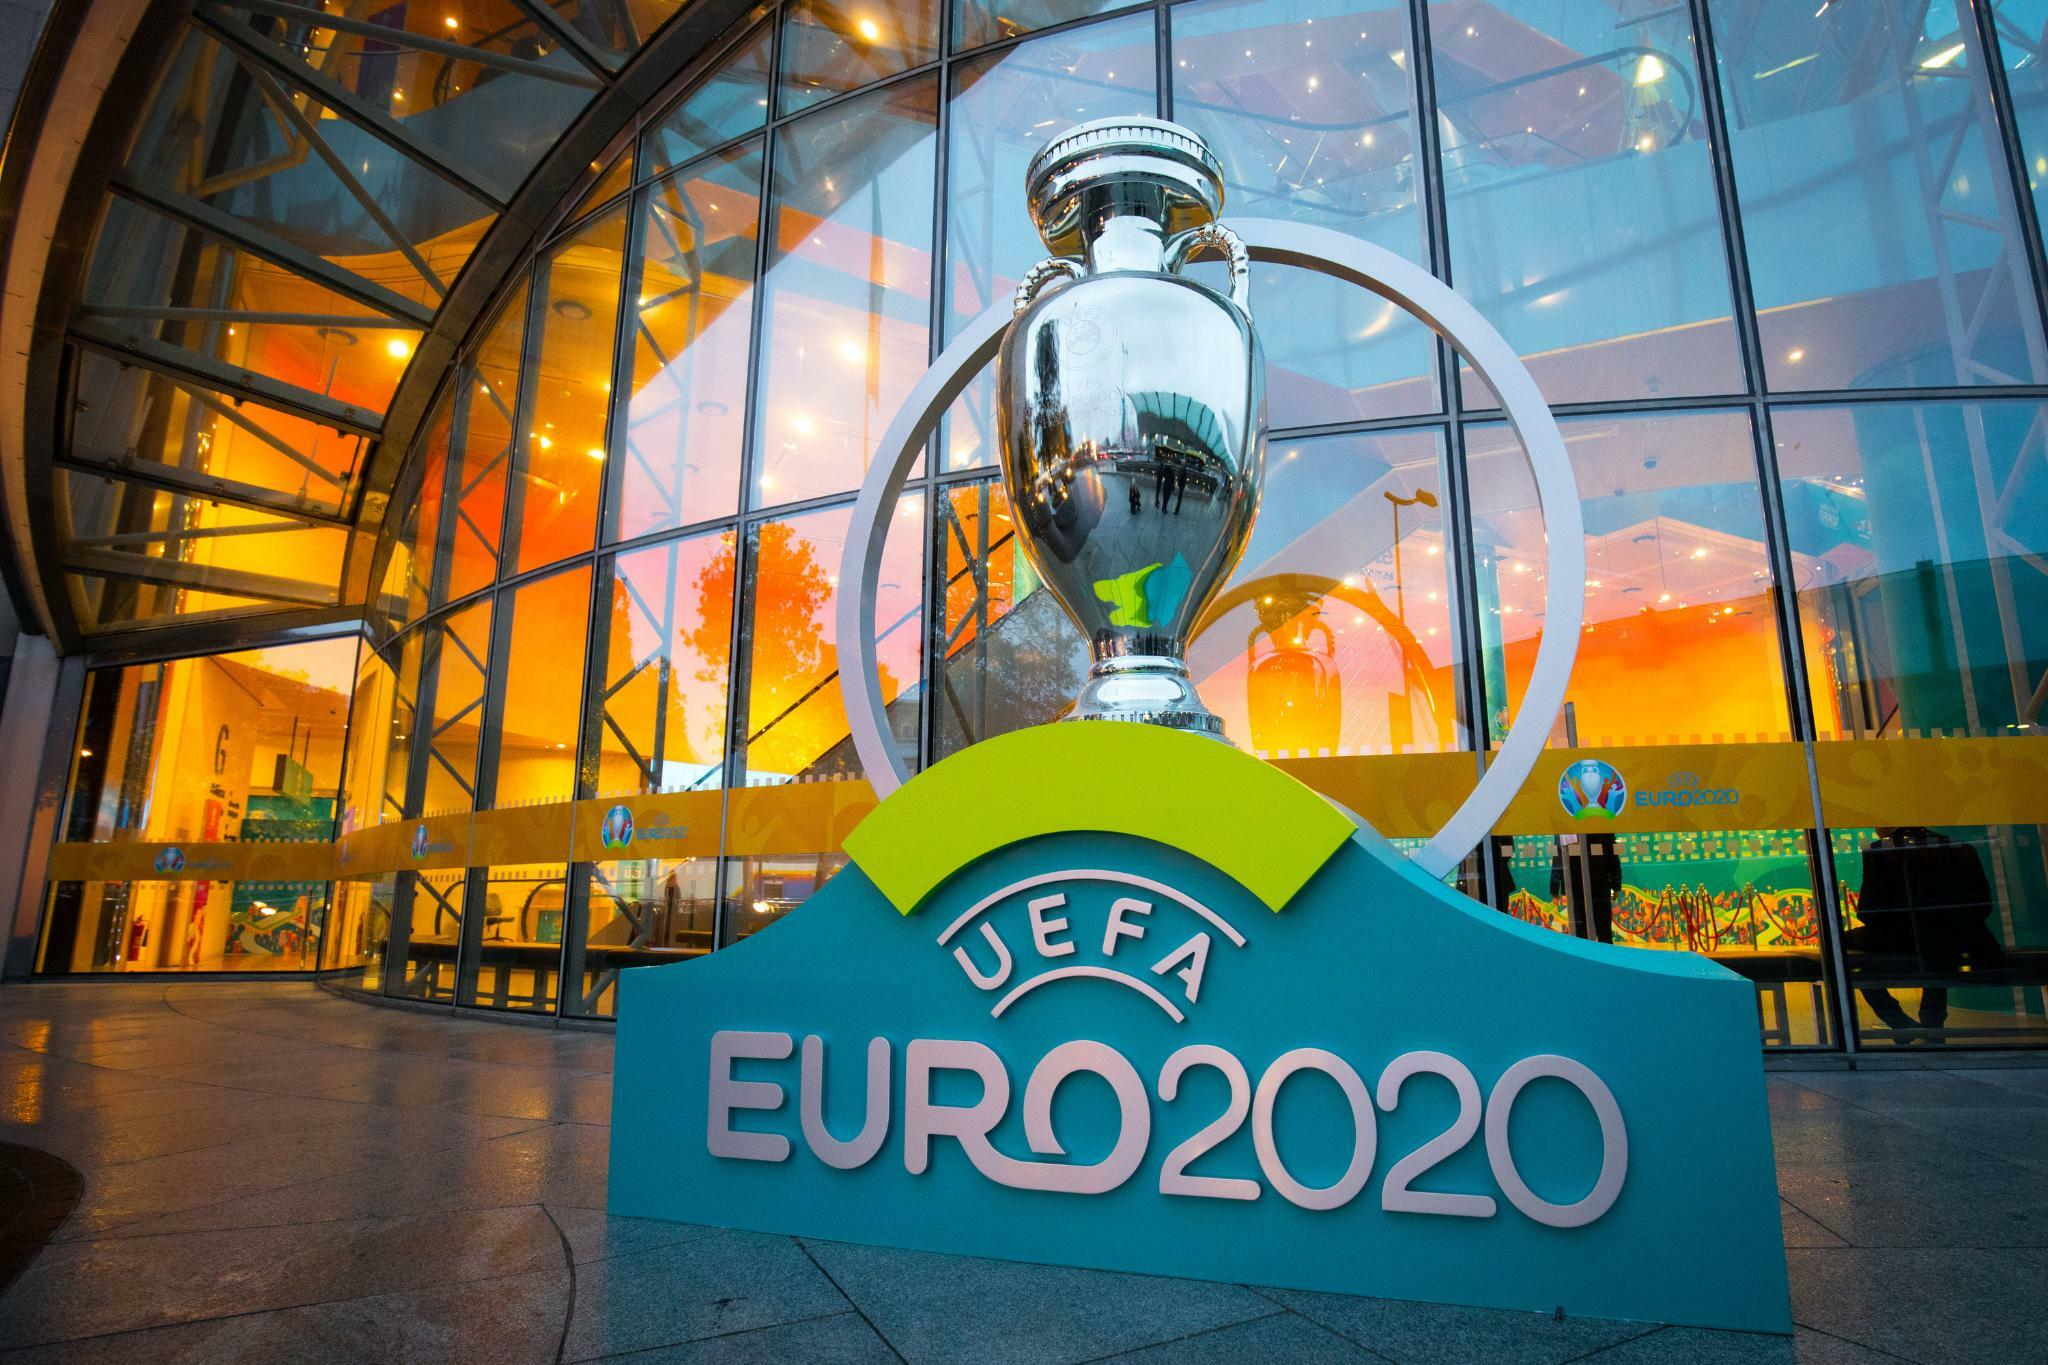 Ещё один российский журналист не аккредитован на Евро-2020 из-за Азербайджана